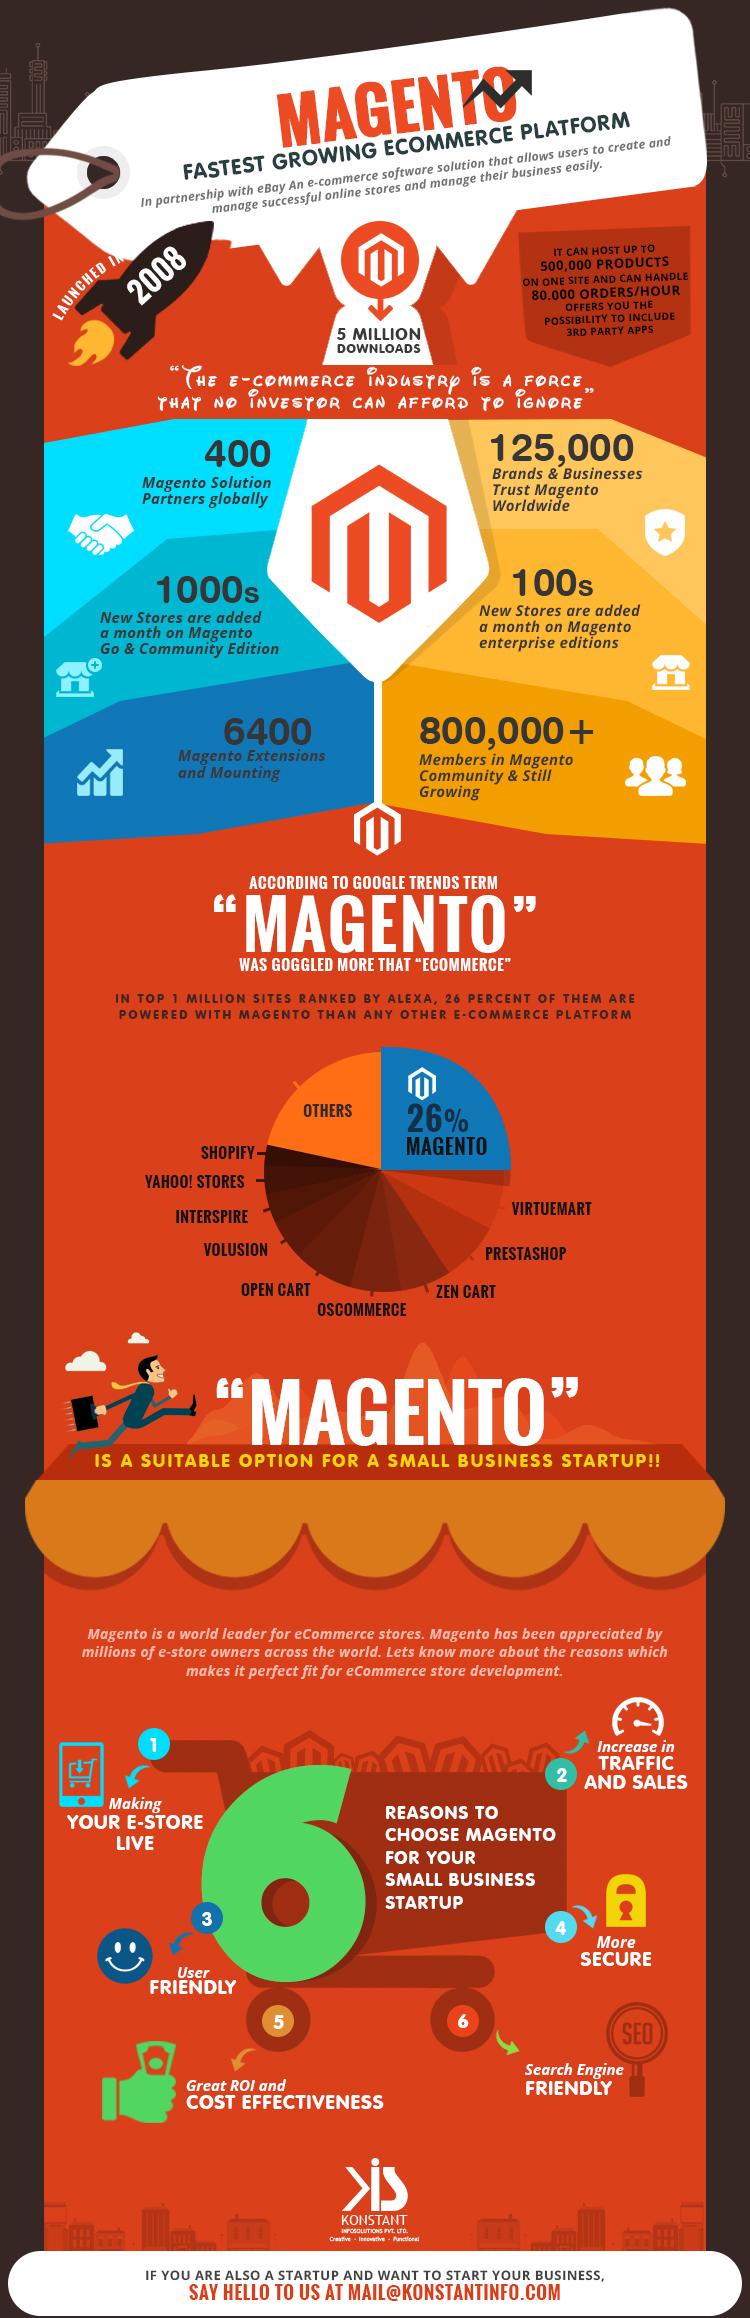 Magento - Fastest Growing eCommerce Platform